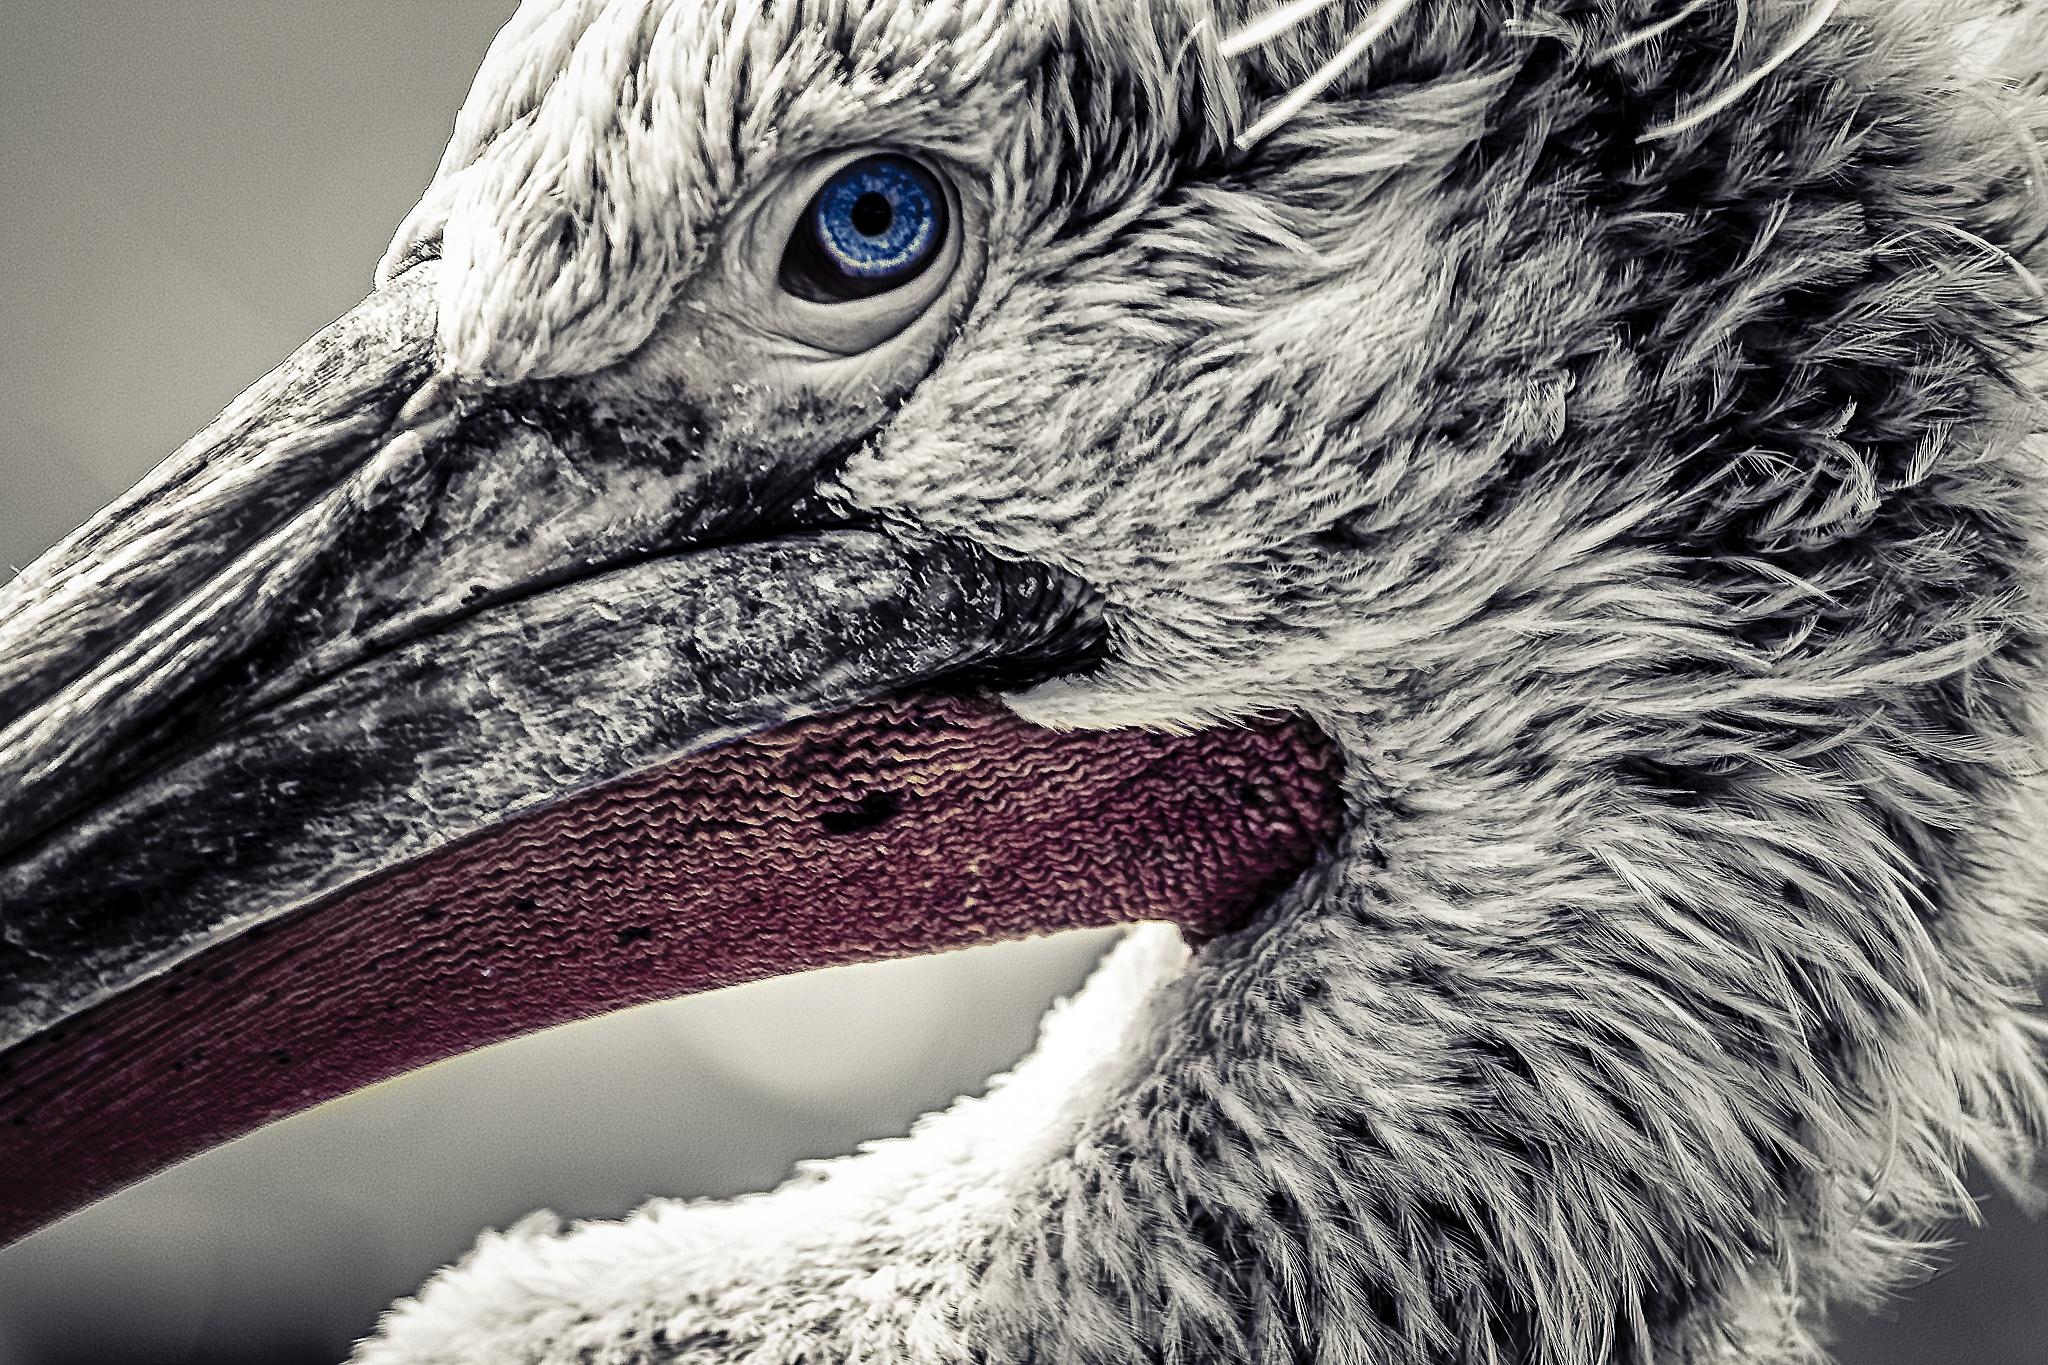 Pelican by Søren Kristiansen